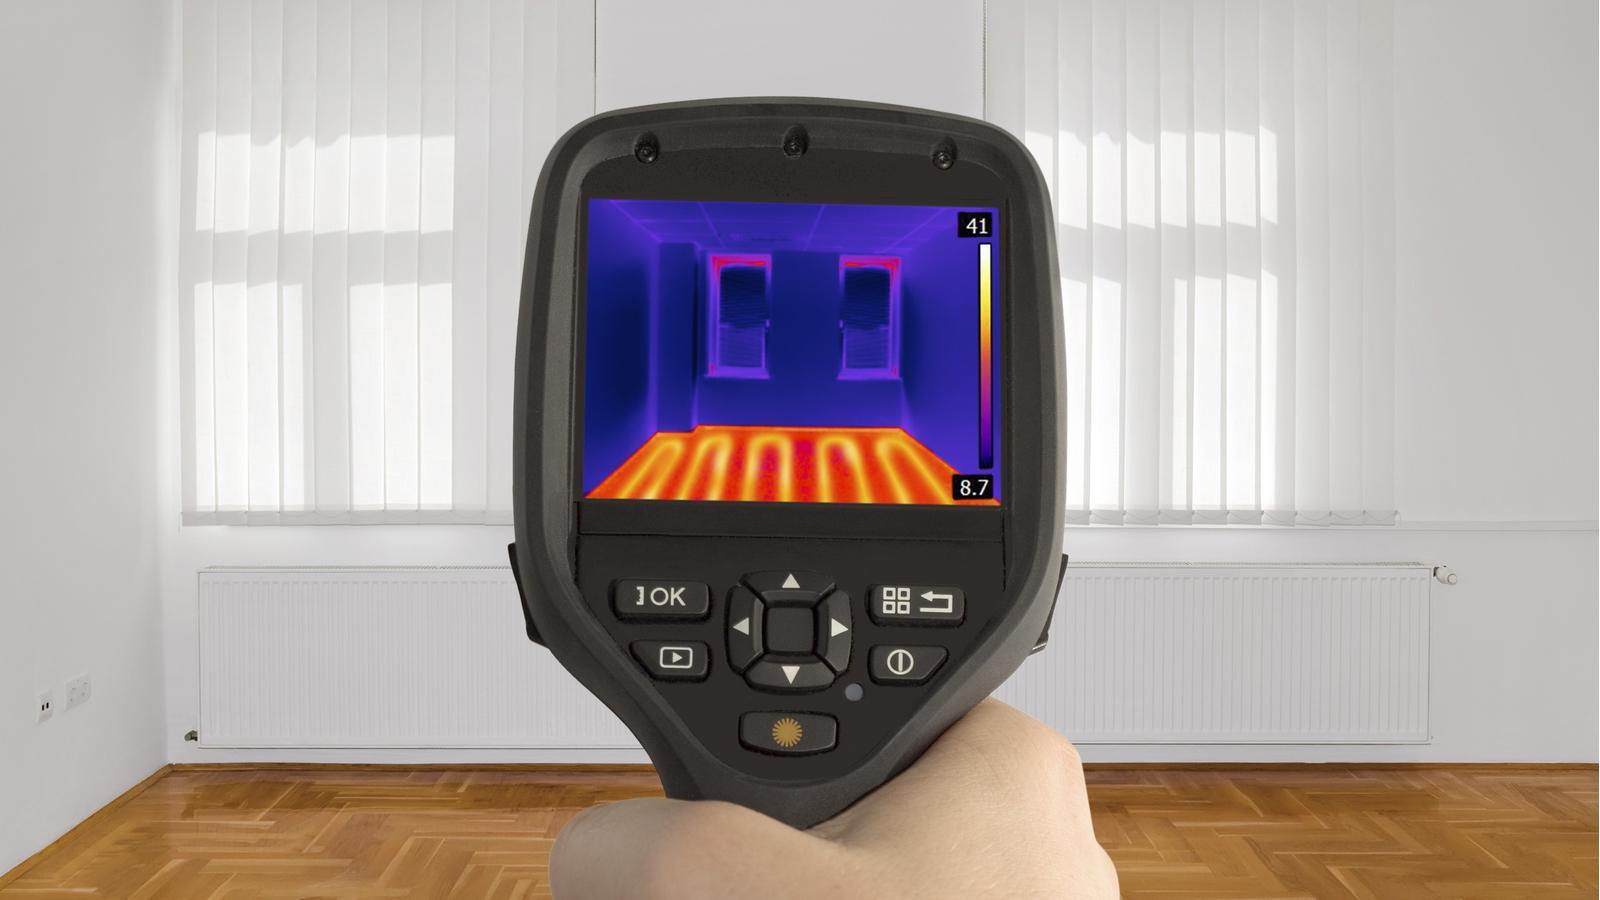 Infrared Camera in Home